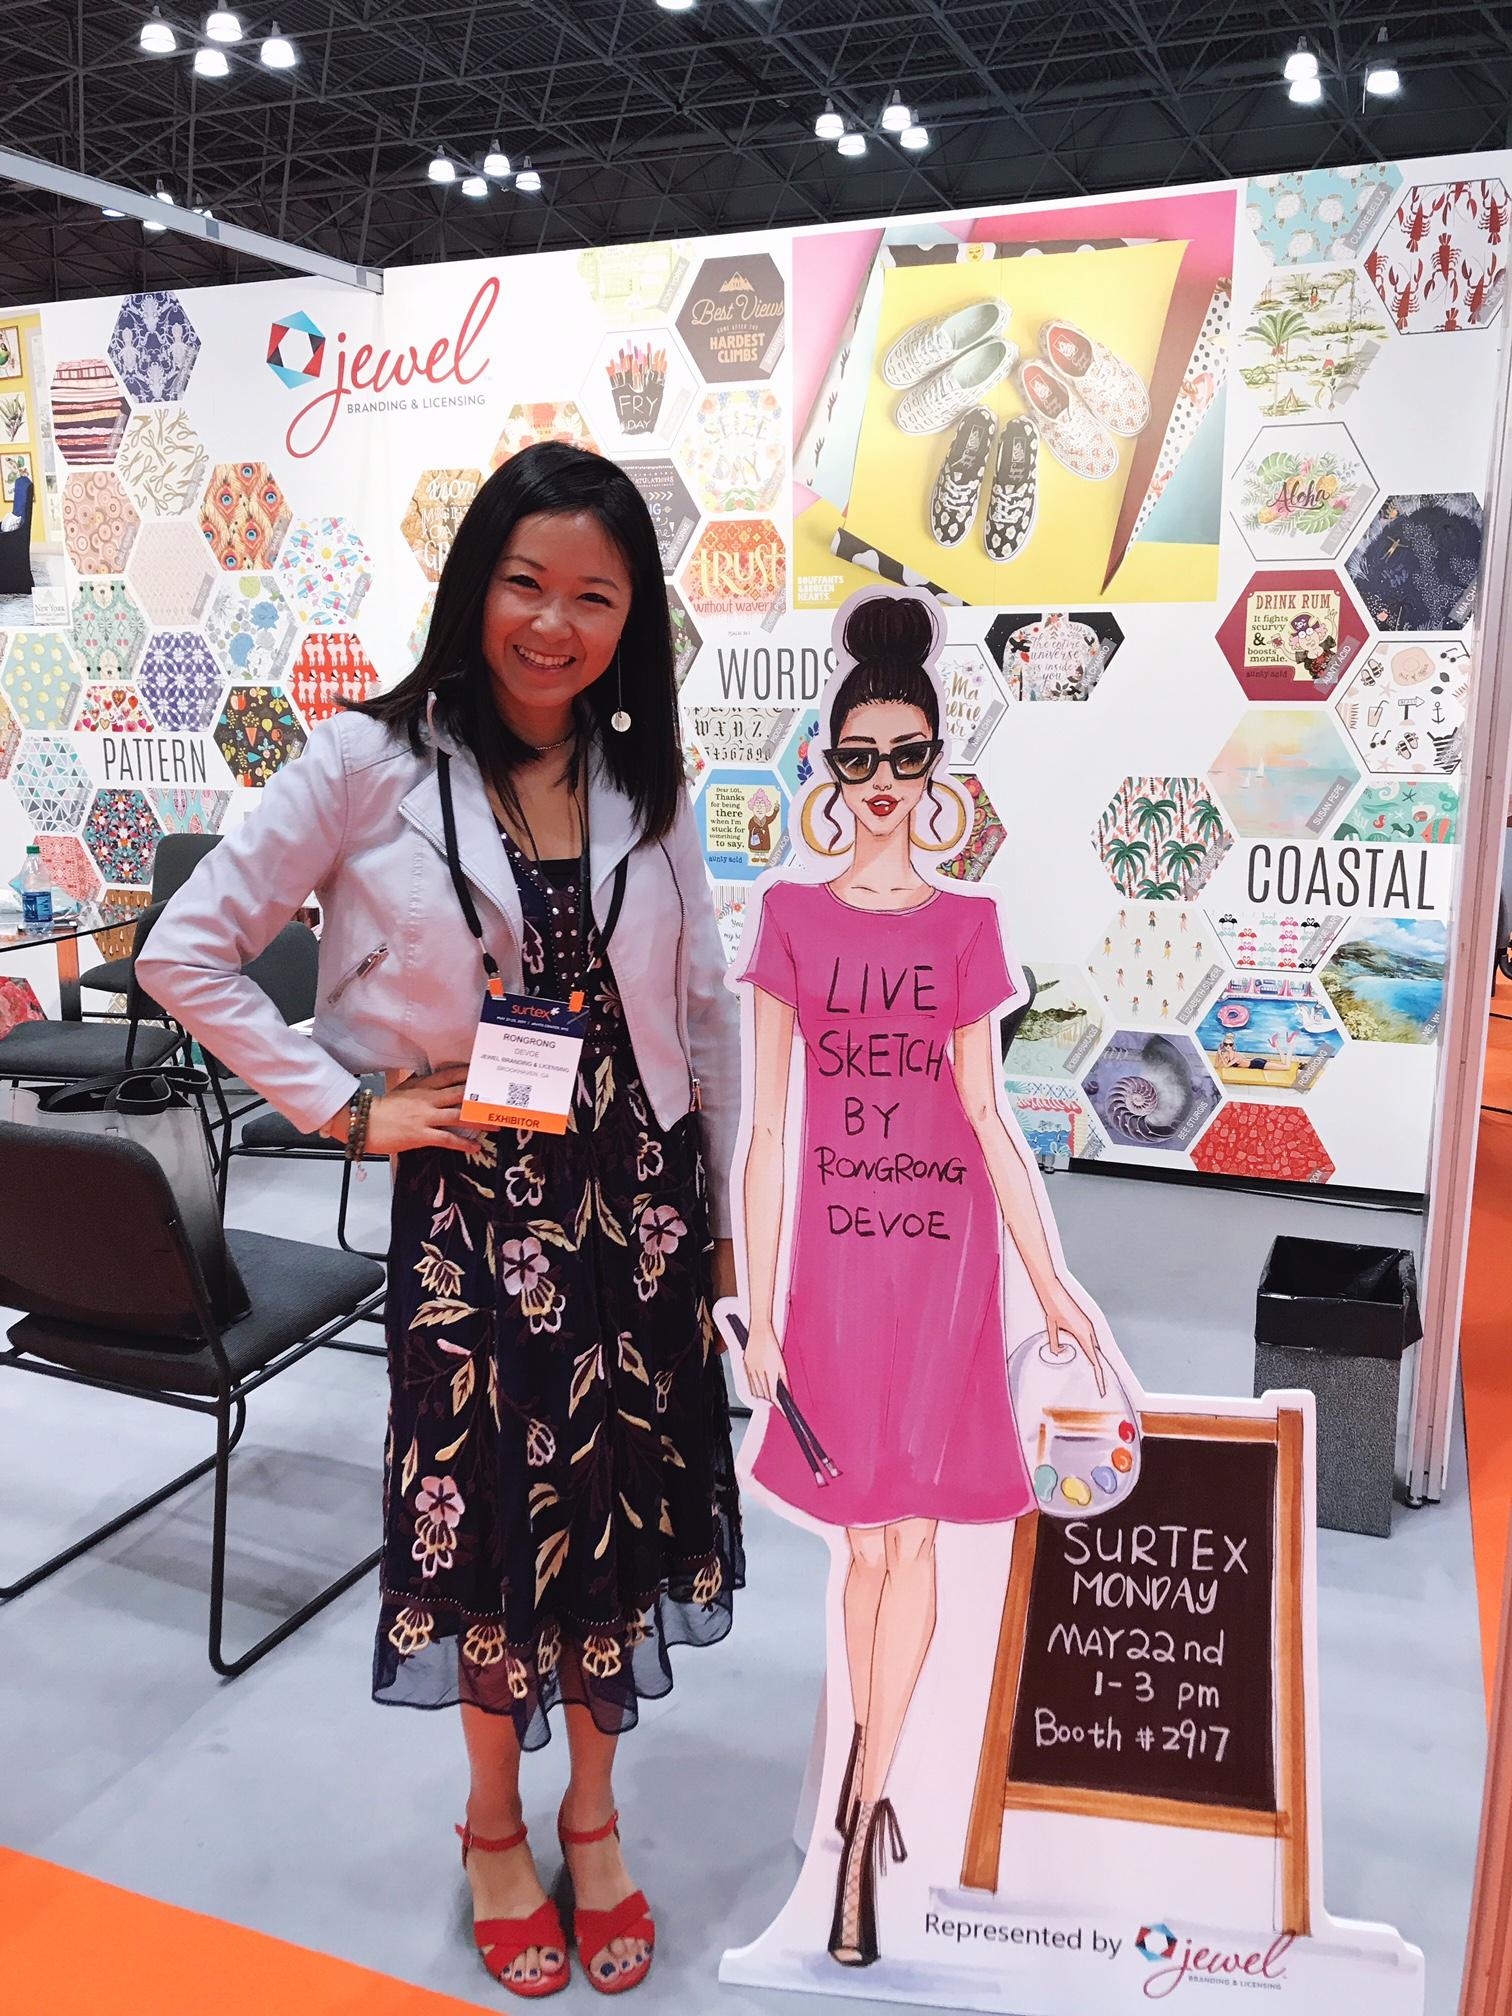 Licensing Artist Rongrong DeVoe at Jewel Branding booth at Surtex 2017